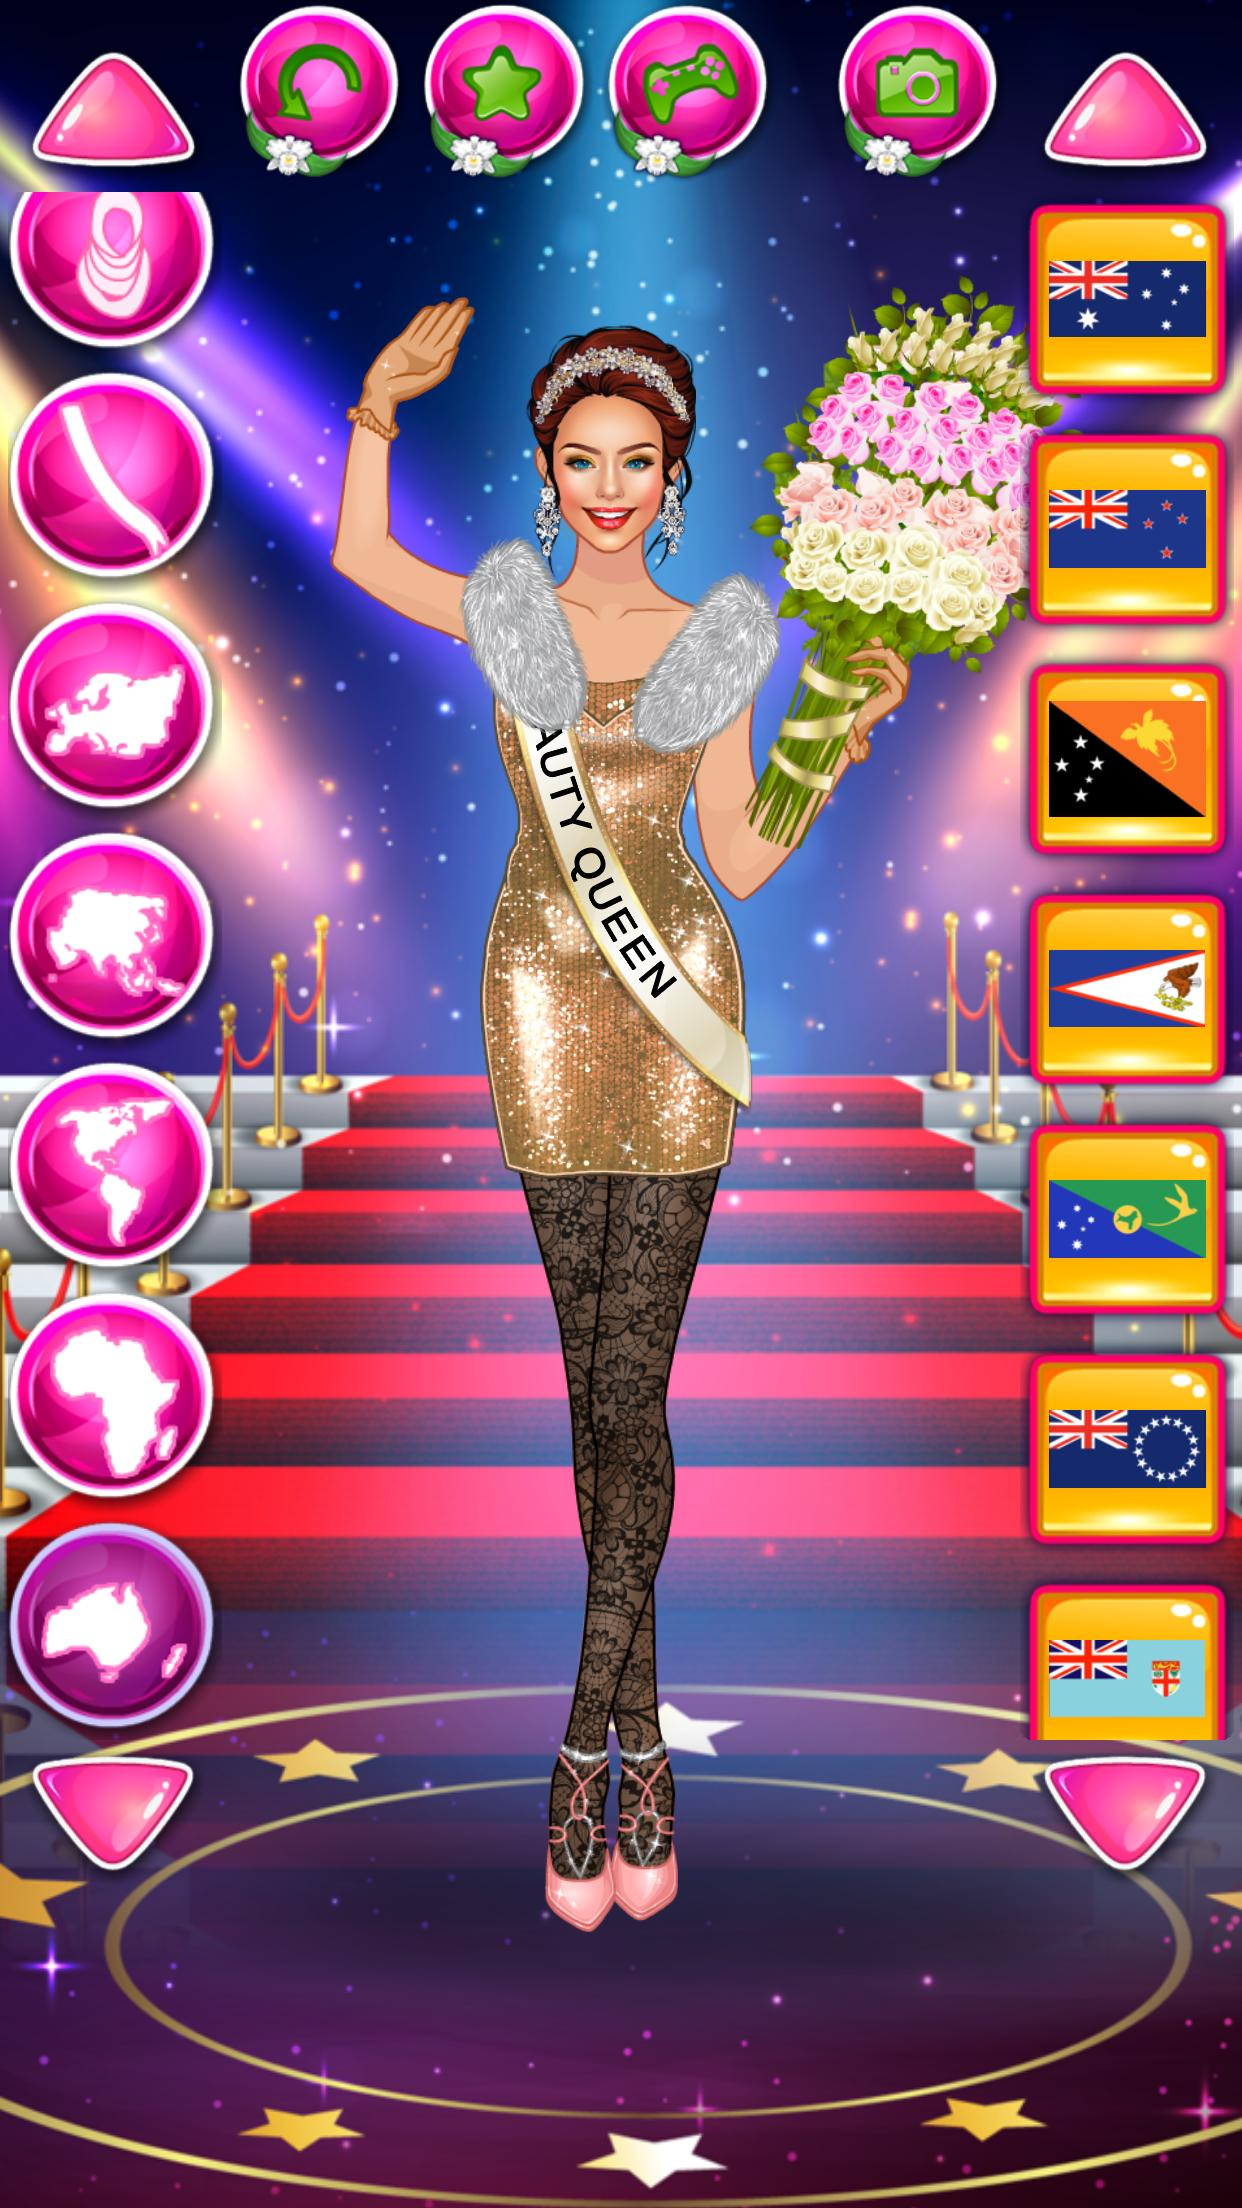 Beauty Queen Dress Up - Star Girl Fashion 1.1 Screenshot 14